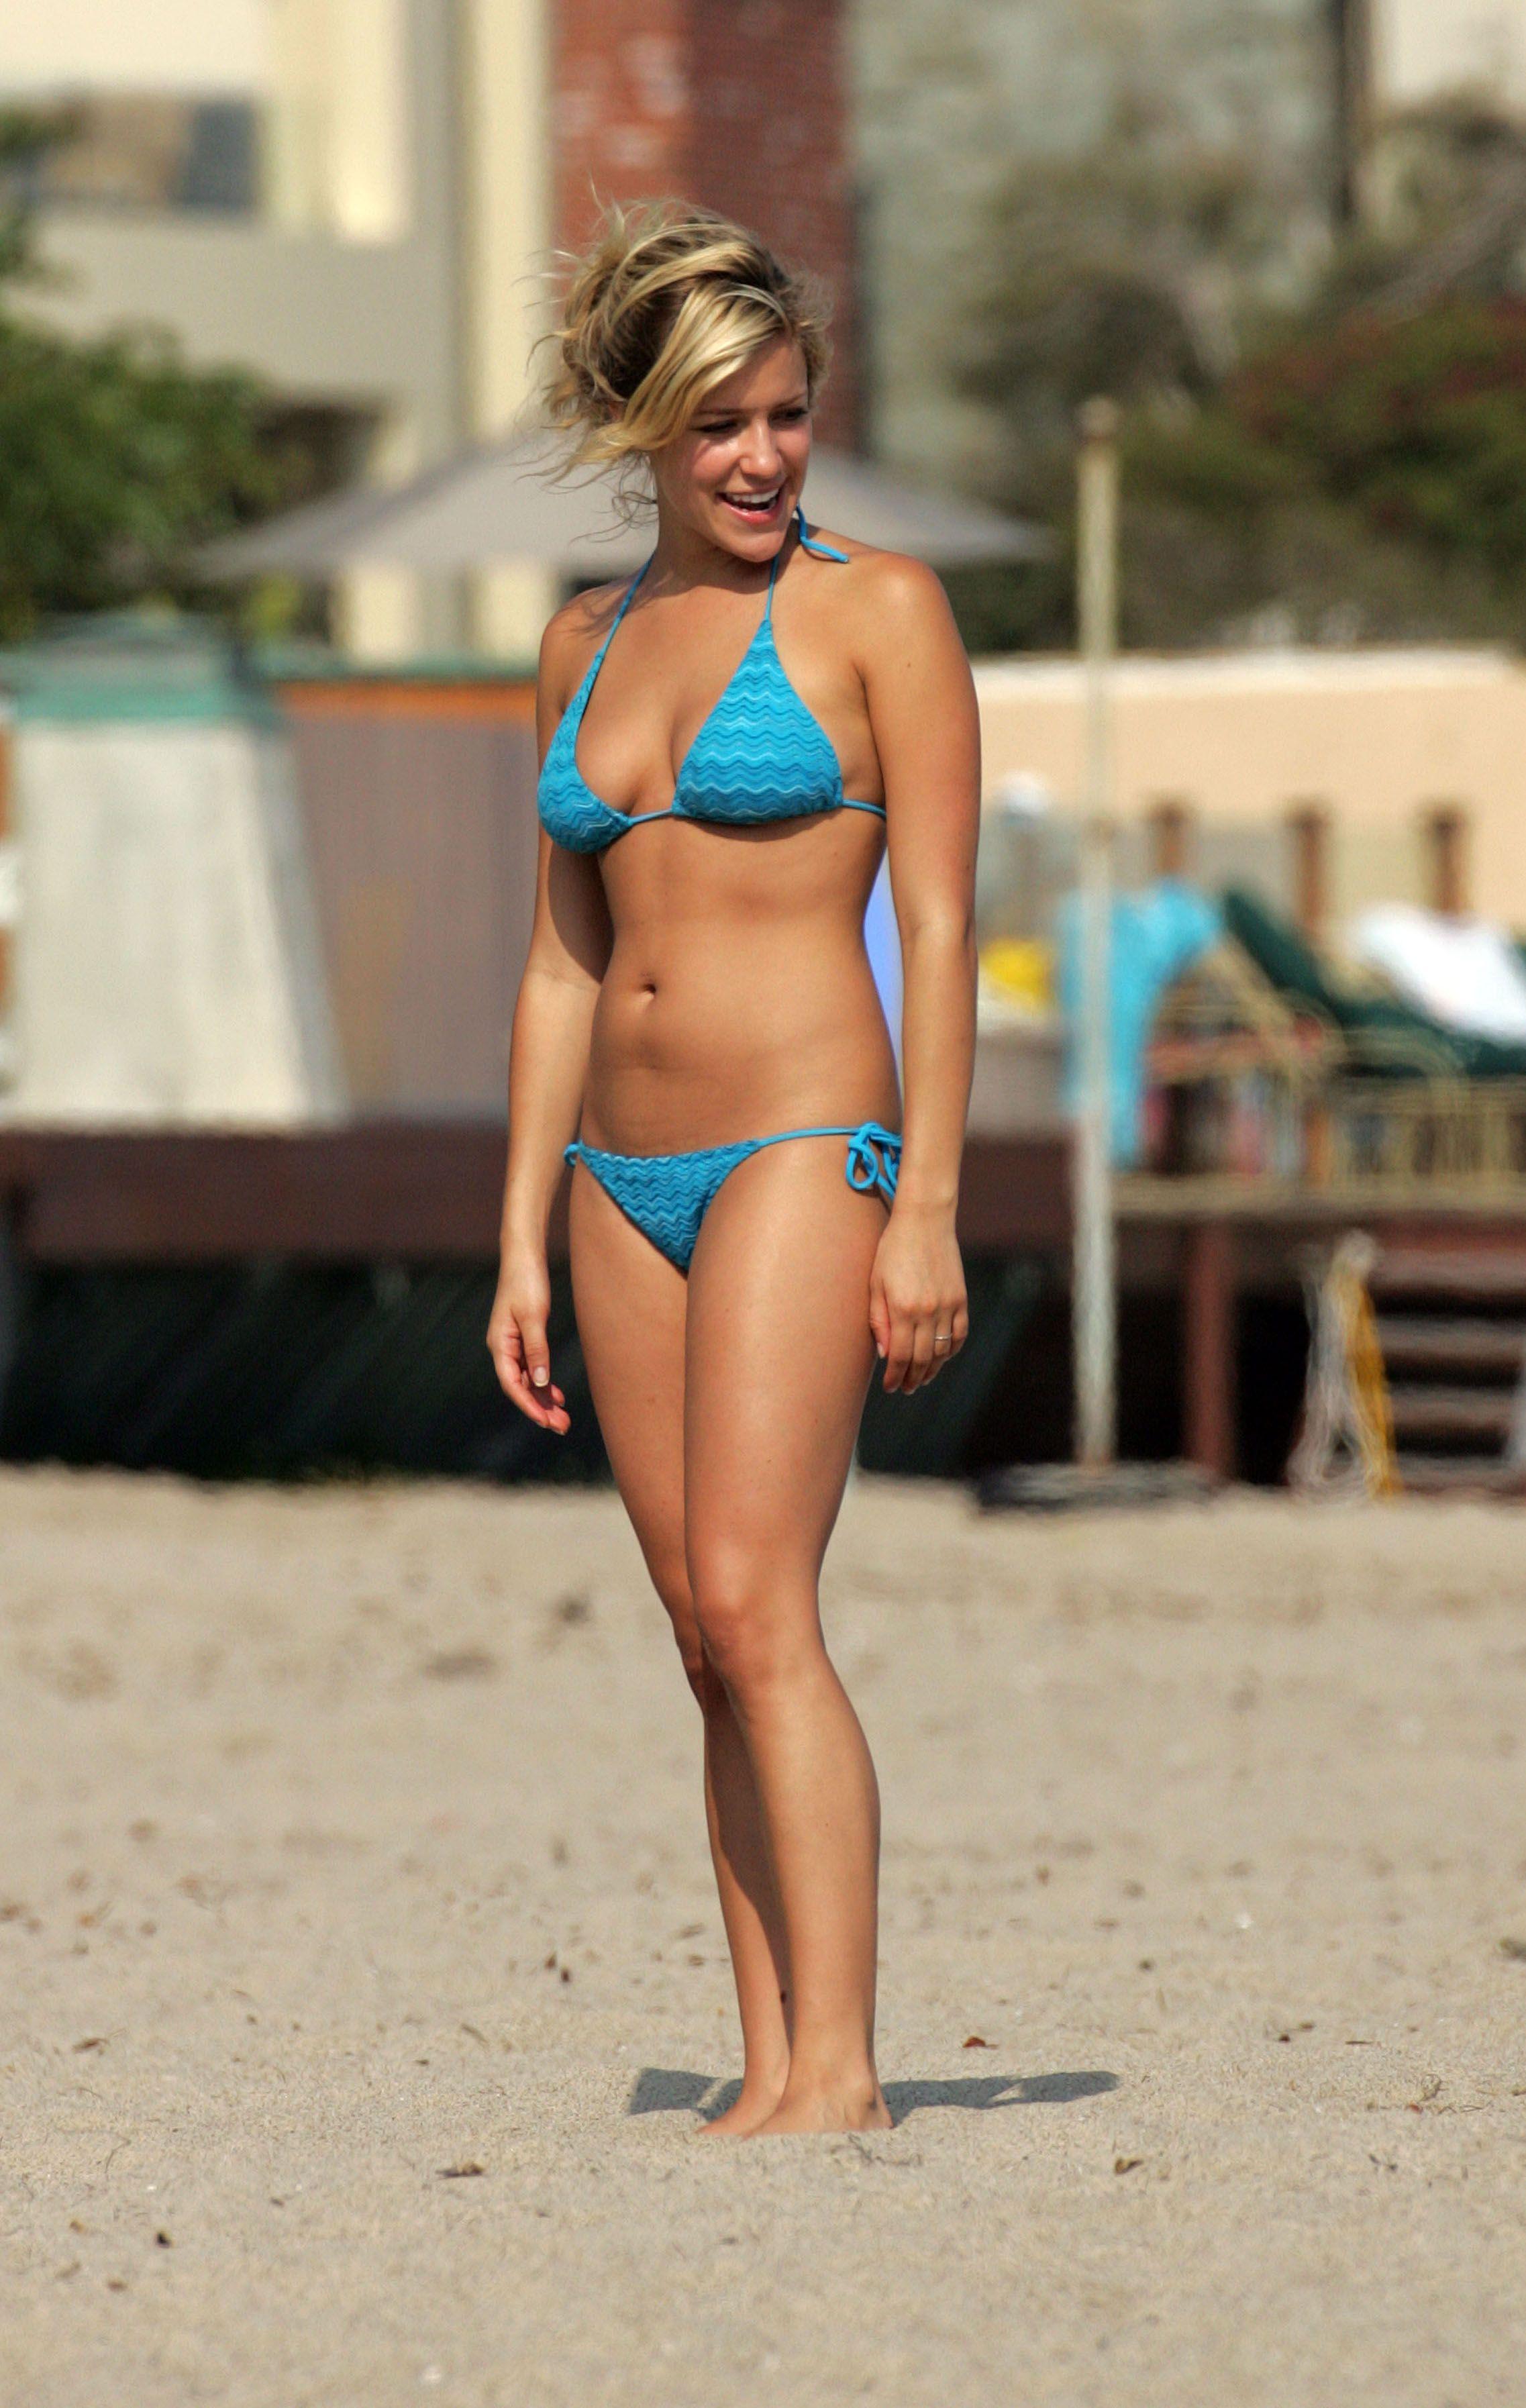 Bikini Kristin Cavallari nude photos 2019